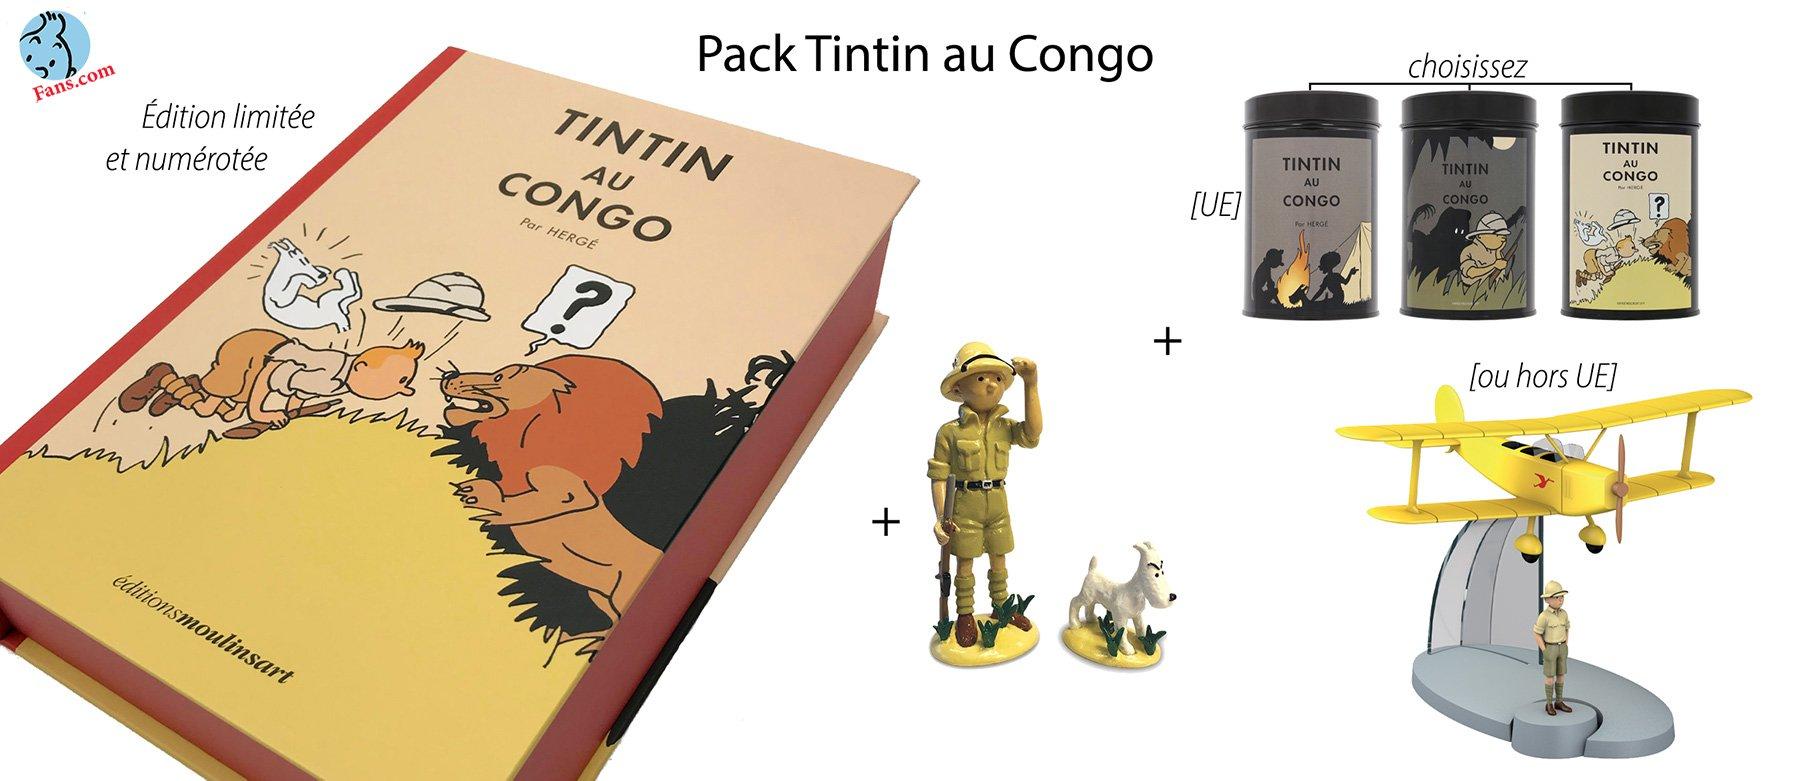 پکیج لیمیتد ادیشن کنگو به مناسب 90 سالگی تن تن